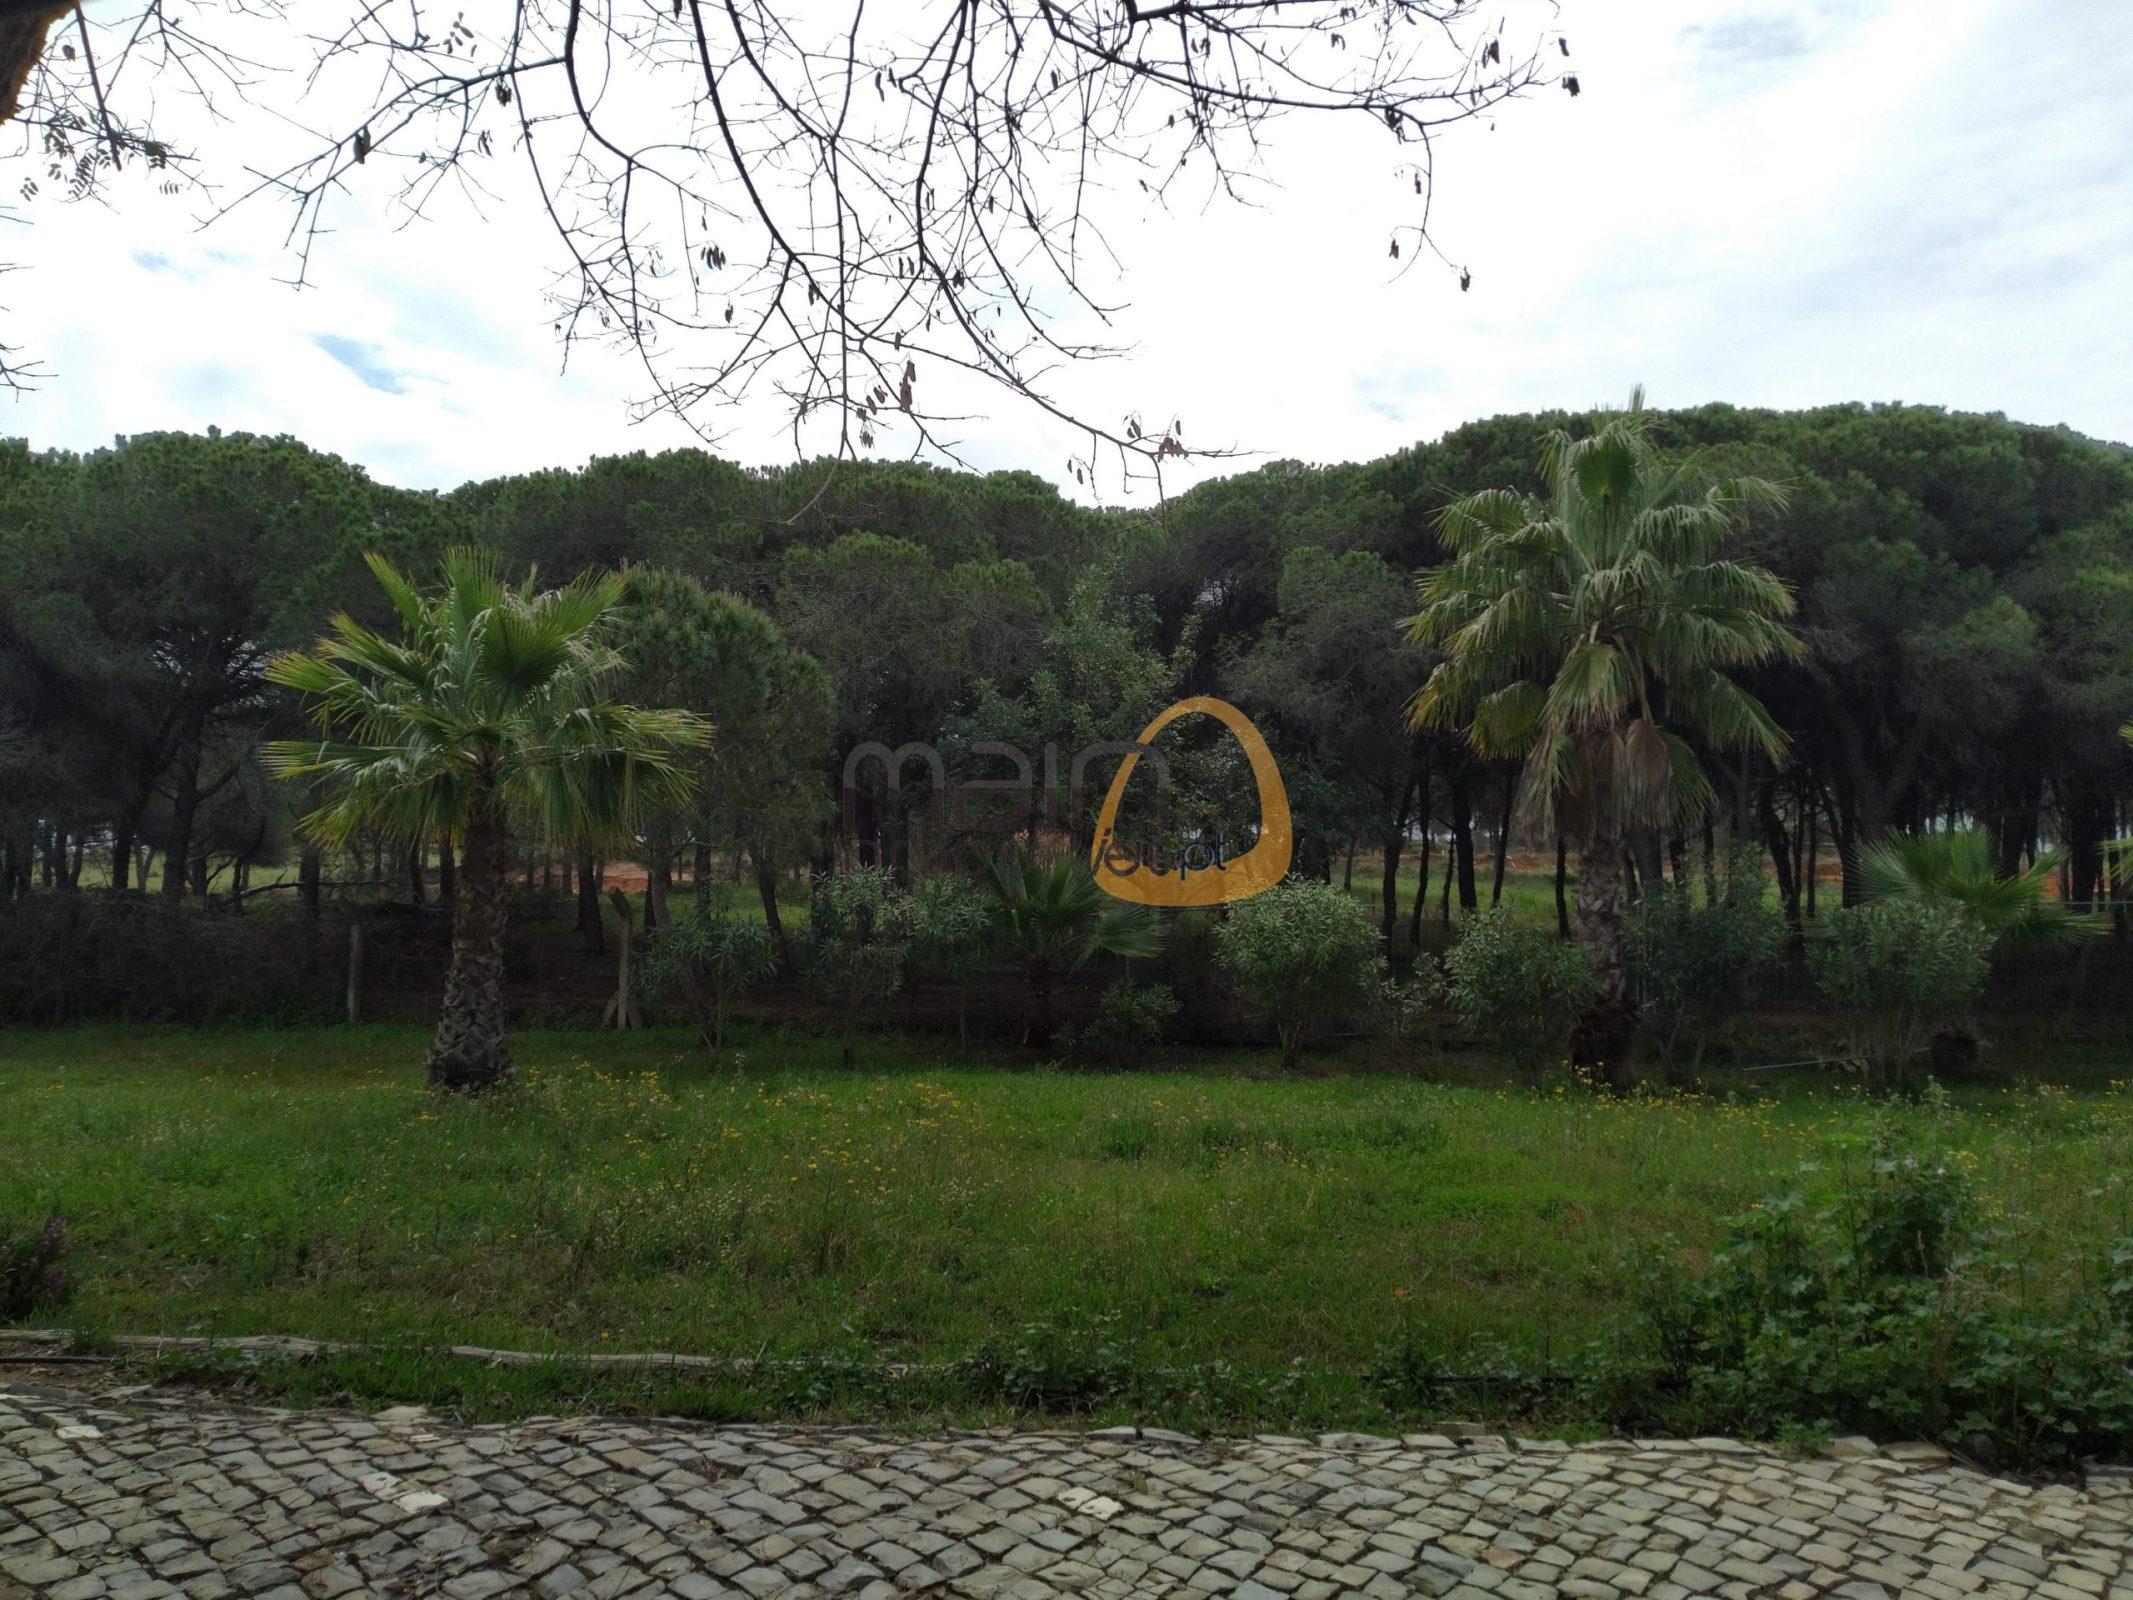 [:pt]Terreno para construção de moradia em Montenegro - Faro : Algarve : Portugal : Terreno 11 :: MR039[:en]Land for Villa construction in Montenegro -  Faro : Algarve : Portugal :: Land 11 :: MainProperties :: MR039[:]